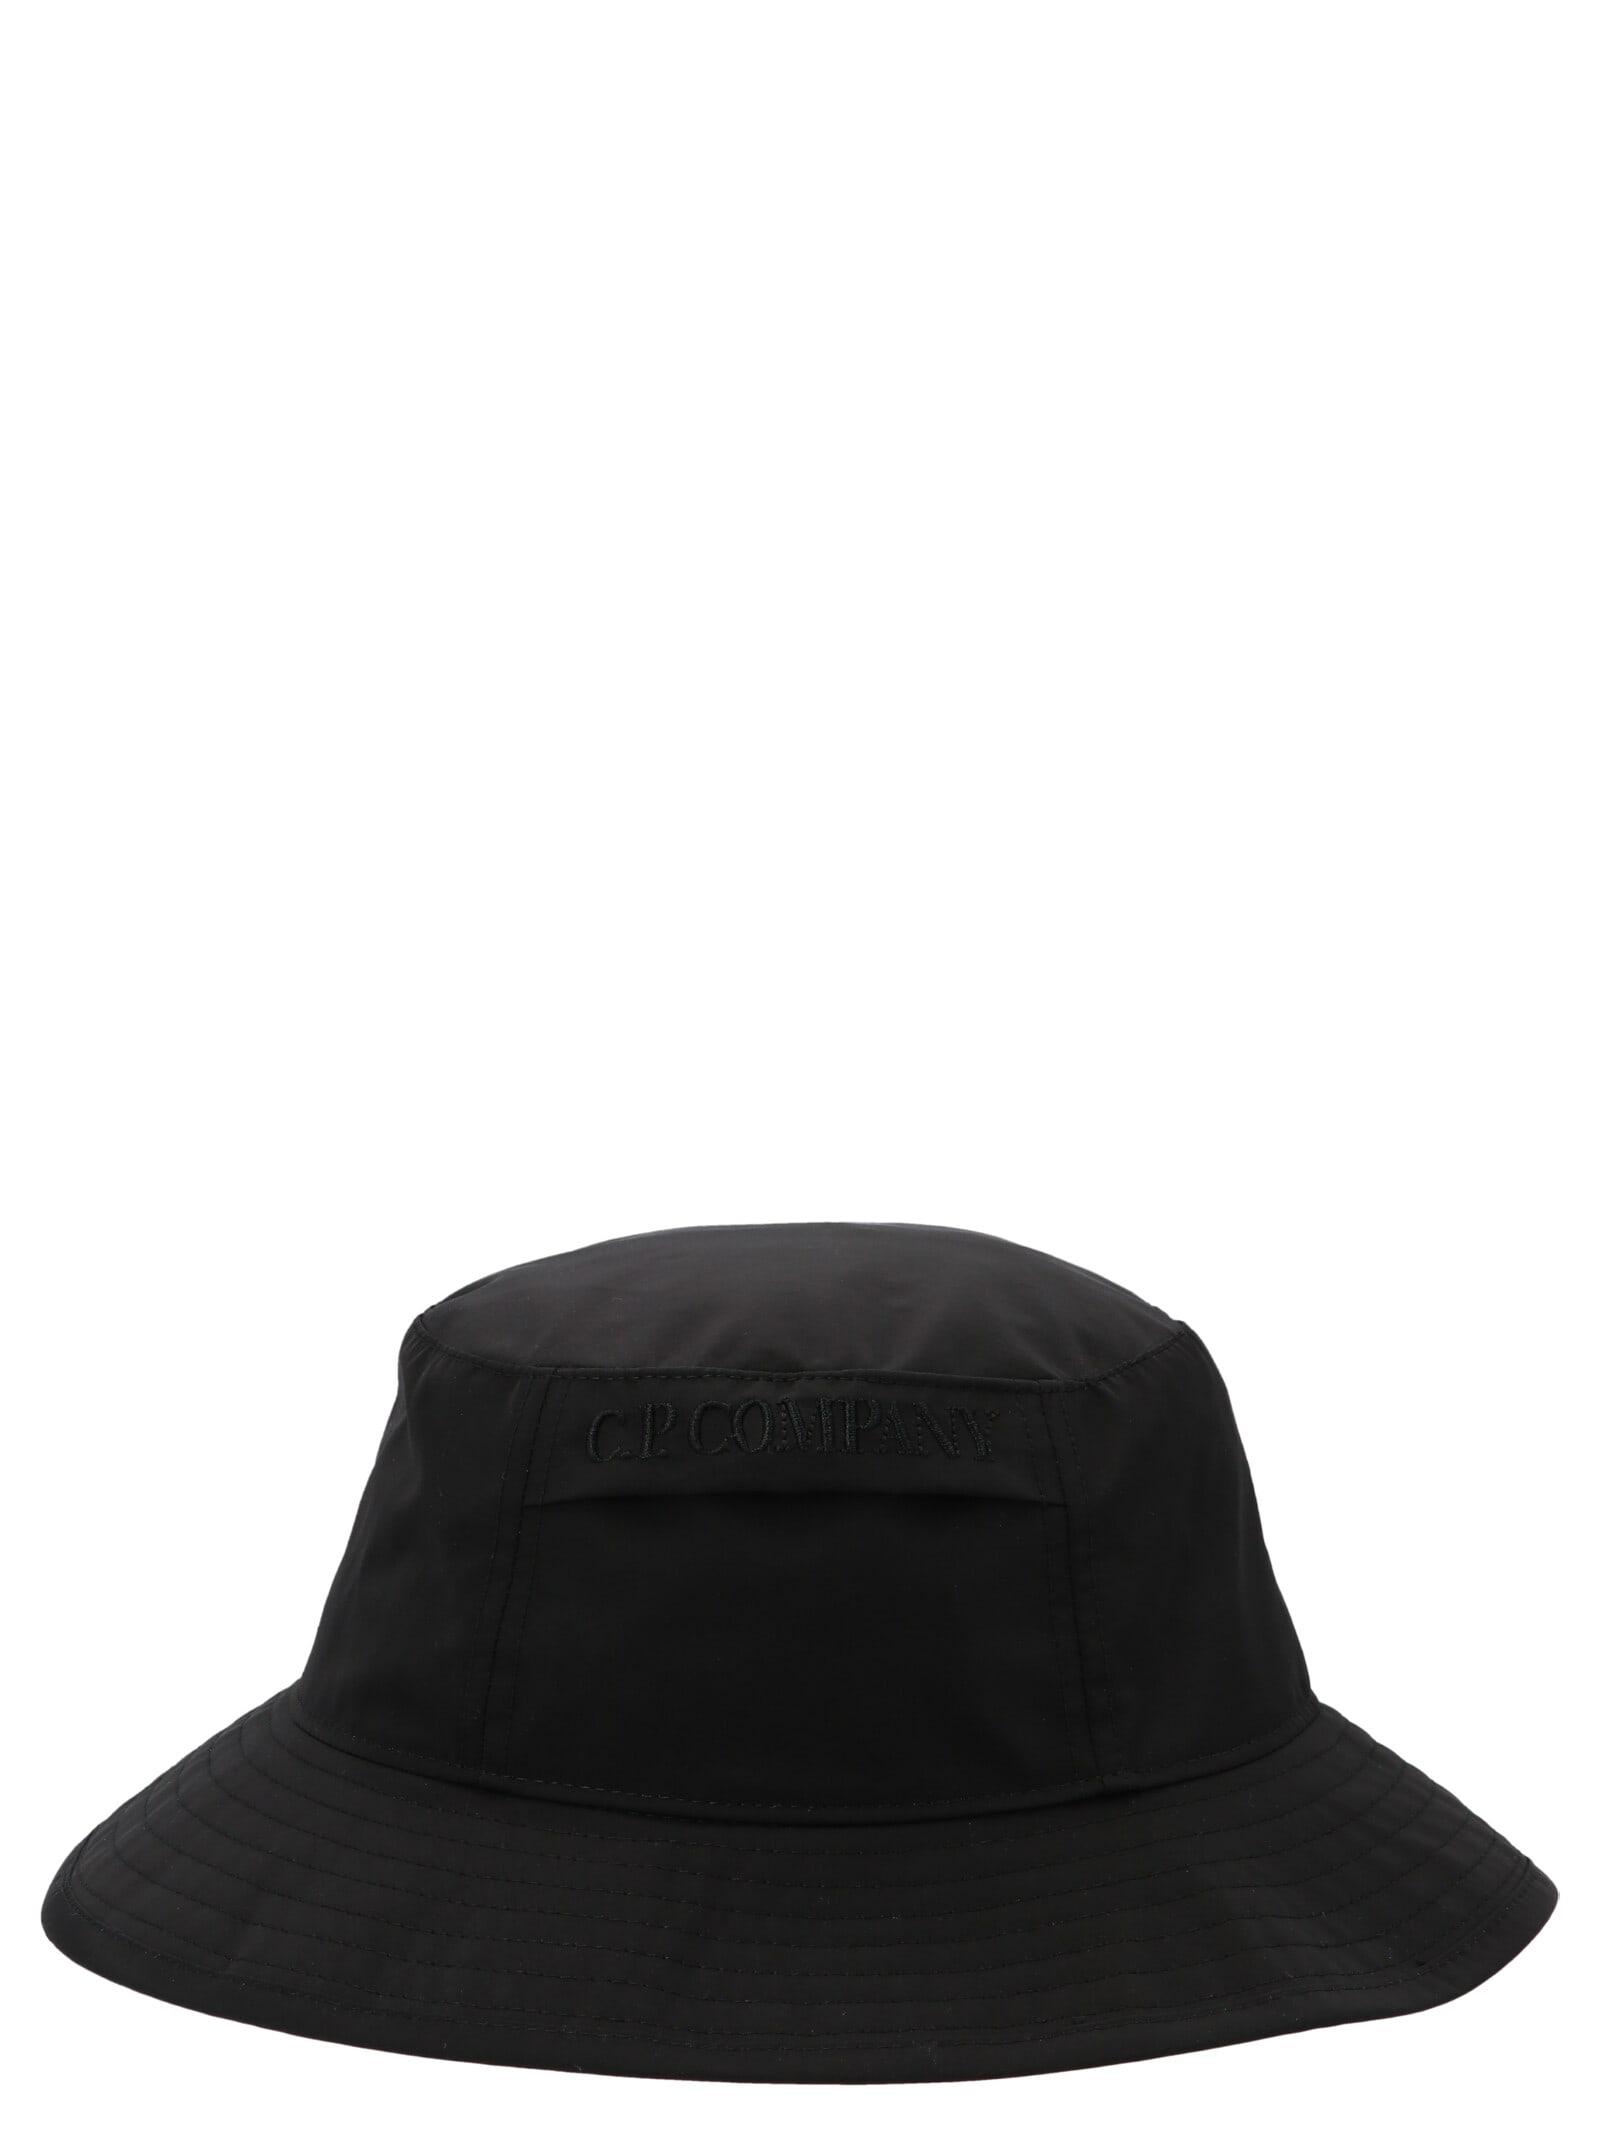 C.p. Company C.P. COMPANY BUCKET HAT